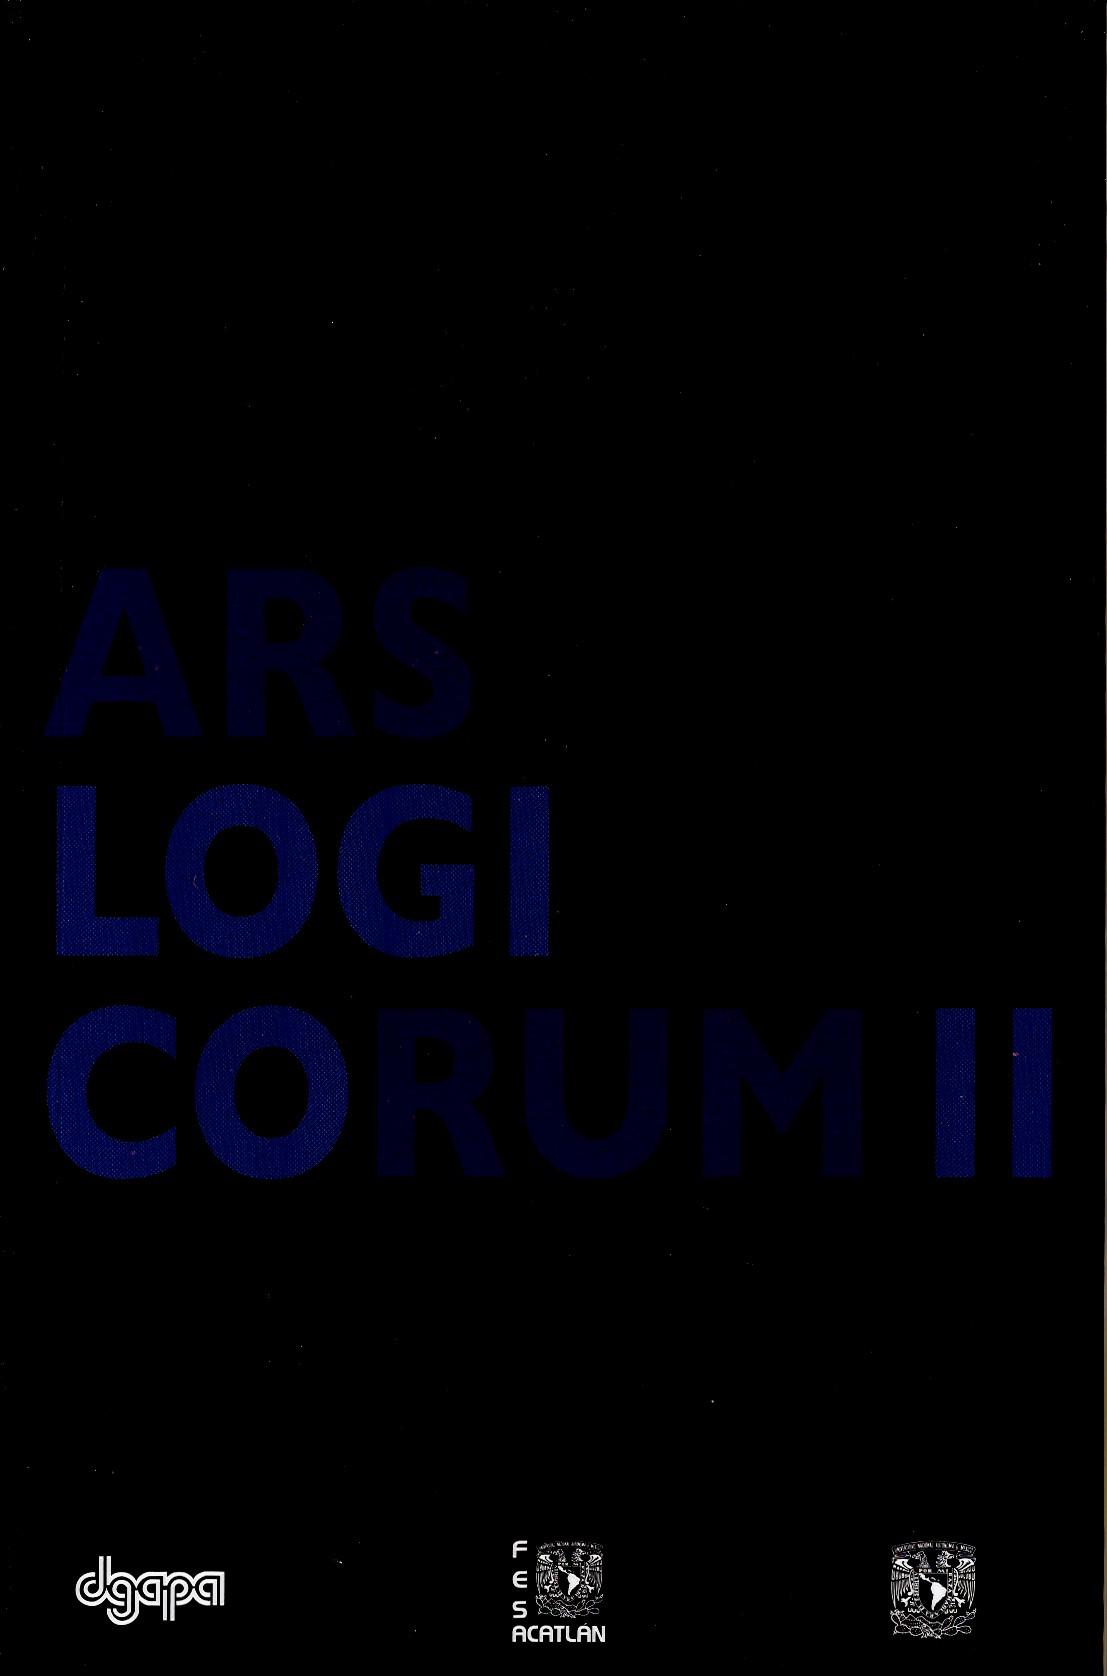 Ars logicorum II